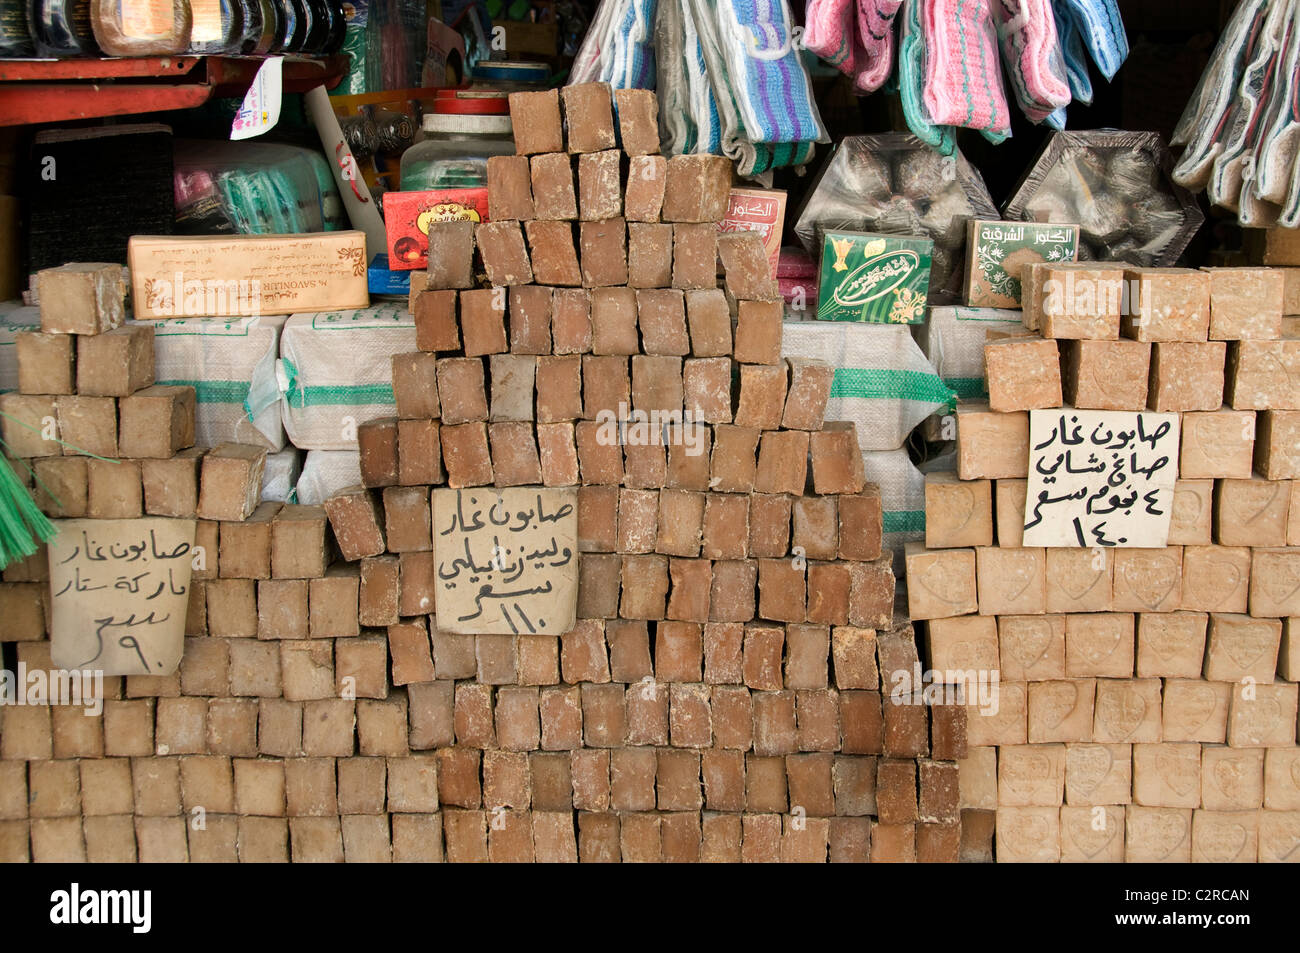 Aleppo Bazaar Soap of olive oil Souk Souq market  Town City Syria  soap shop - Stock Image